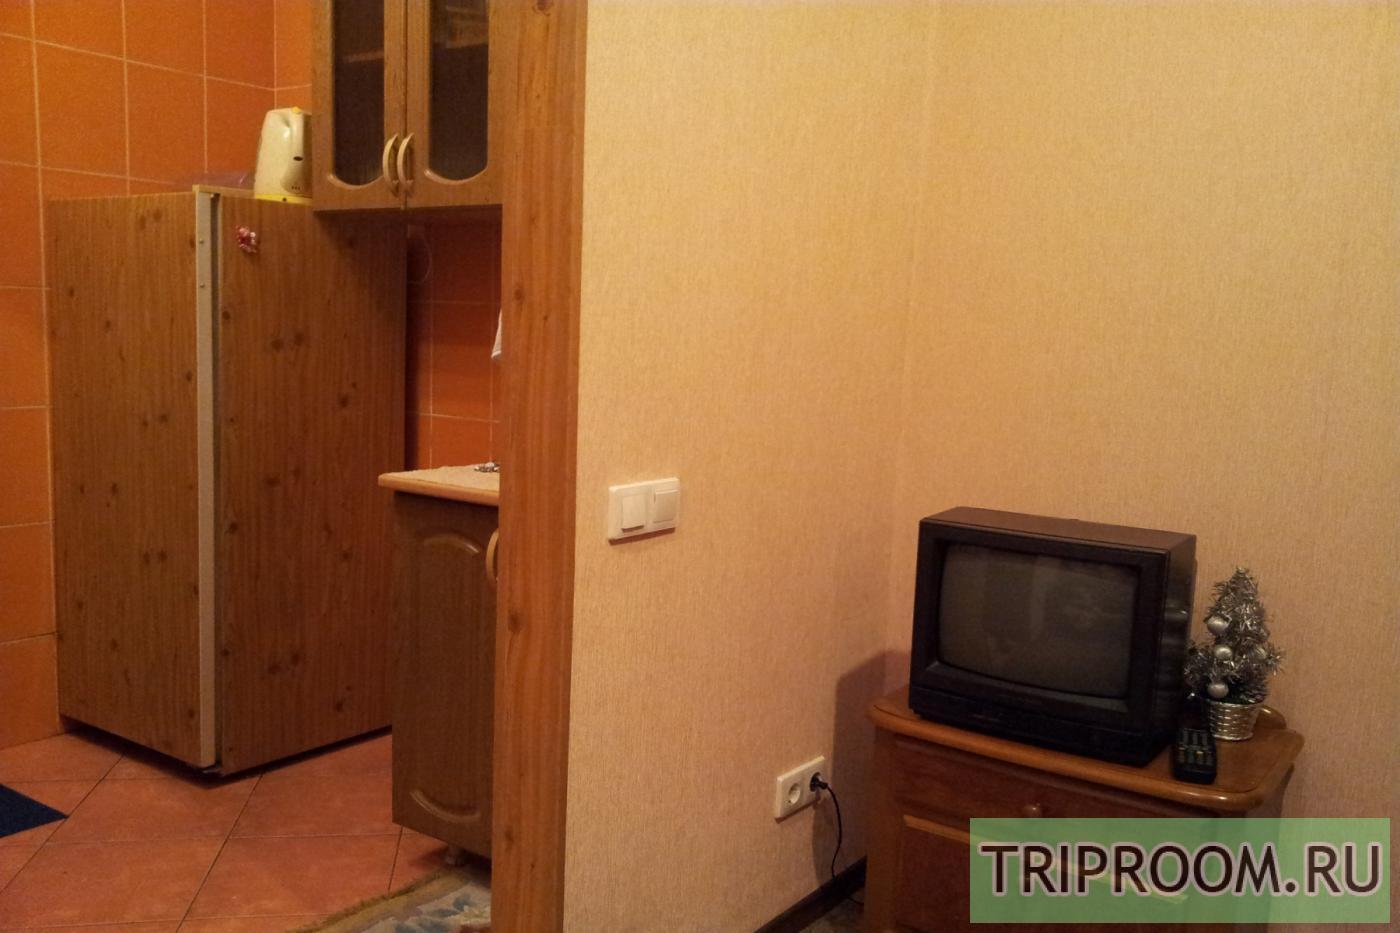 1-комнатная квартира посуточно (вариант № 30855), ул. Кузнецова улица, фото № 6